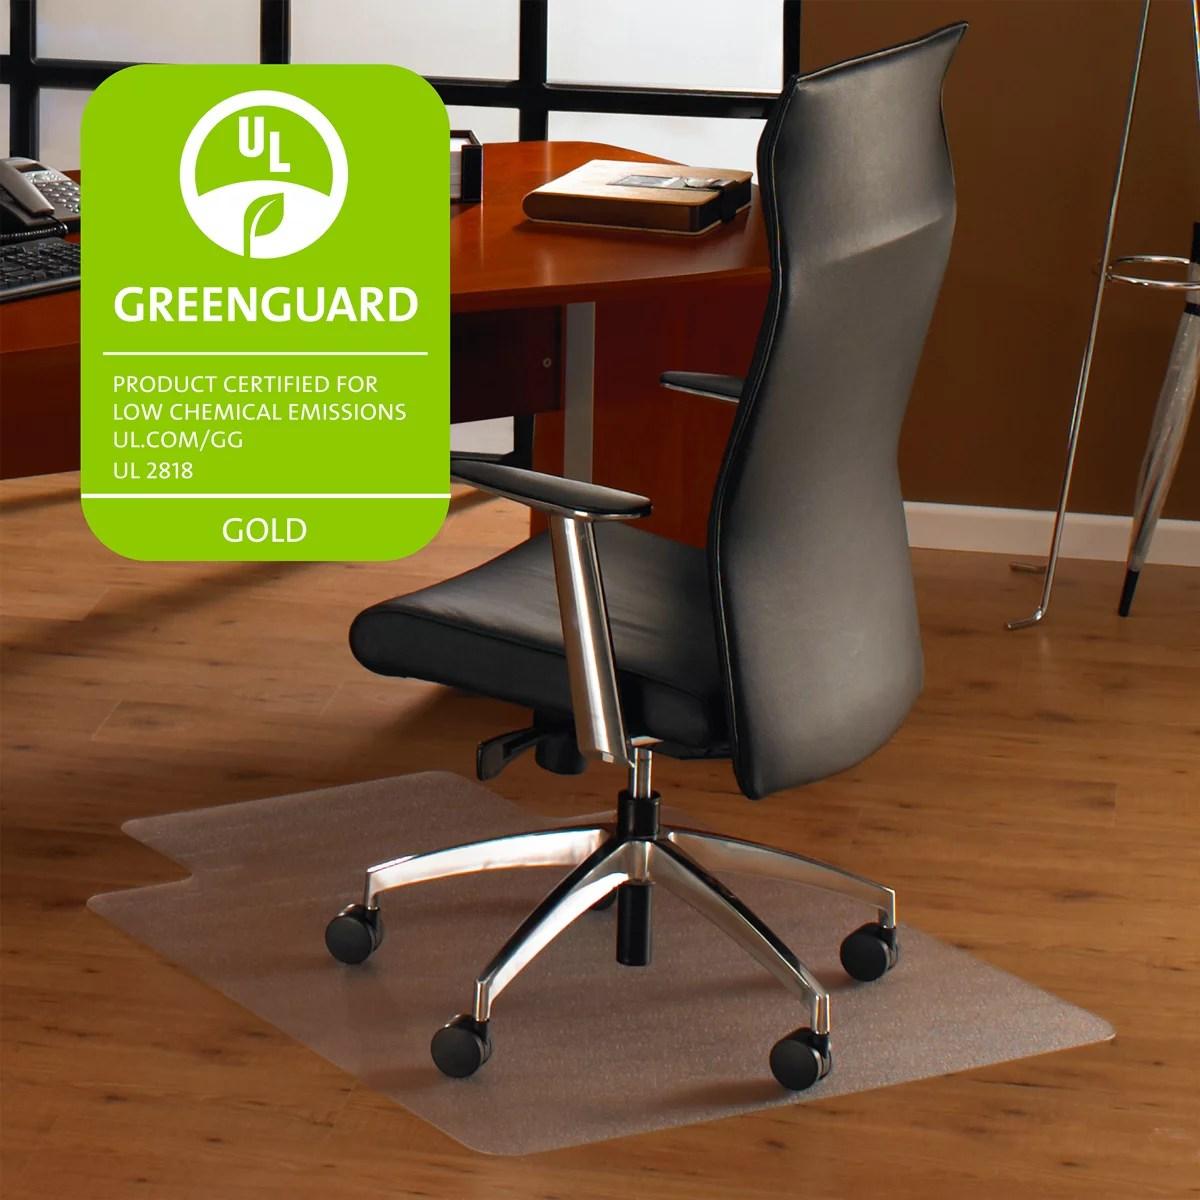 office chair mat 45 x 60 classy bean bag chairs floortex cleartex ultimat 48 for hard floor rectangular with lip walmart com